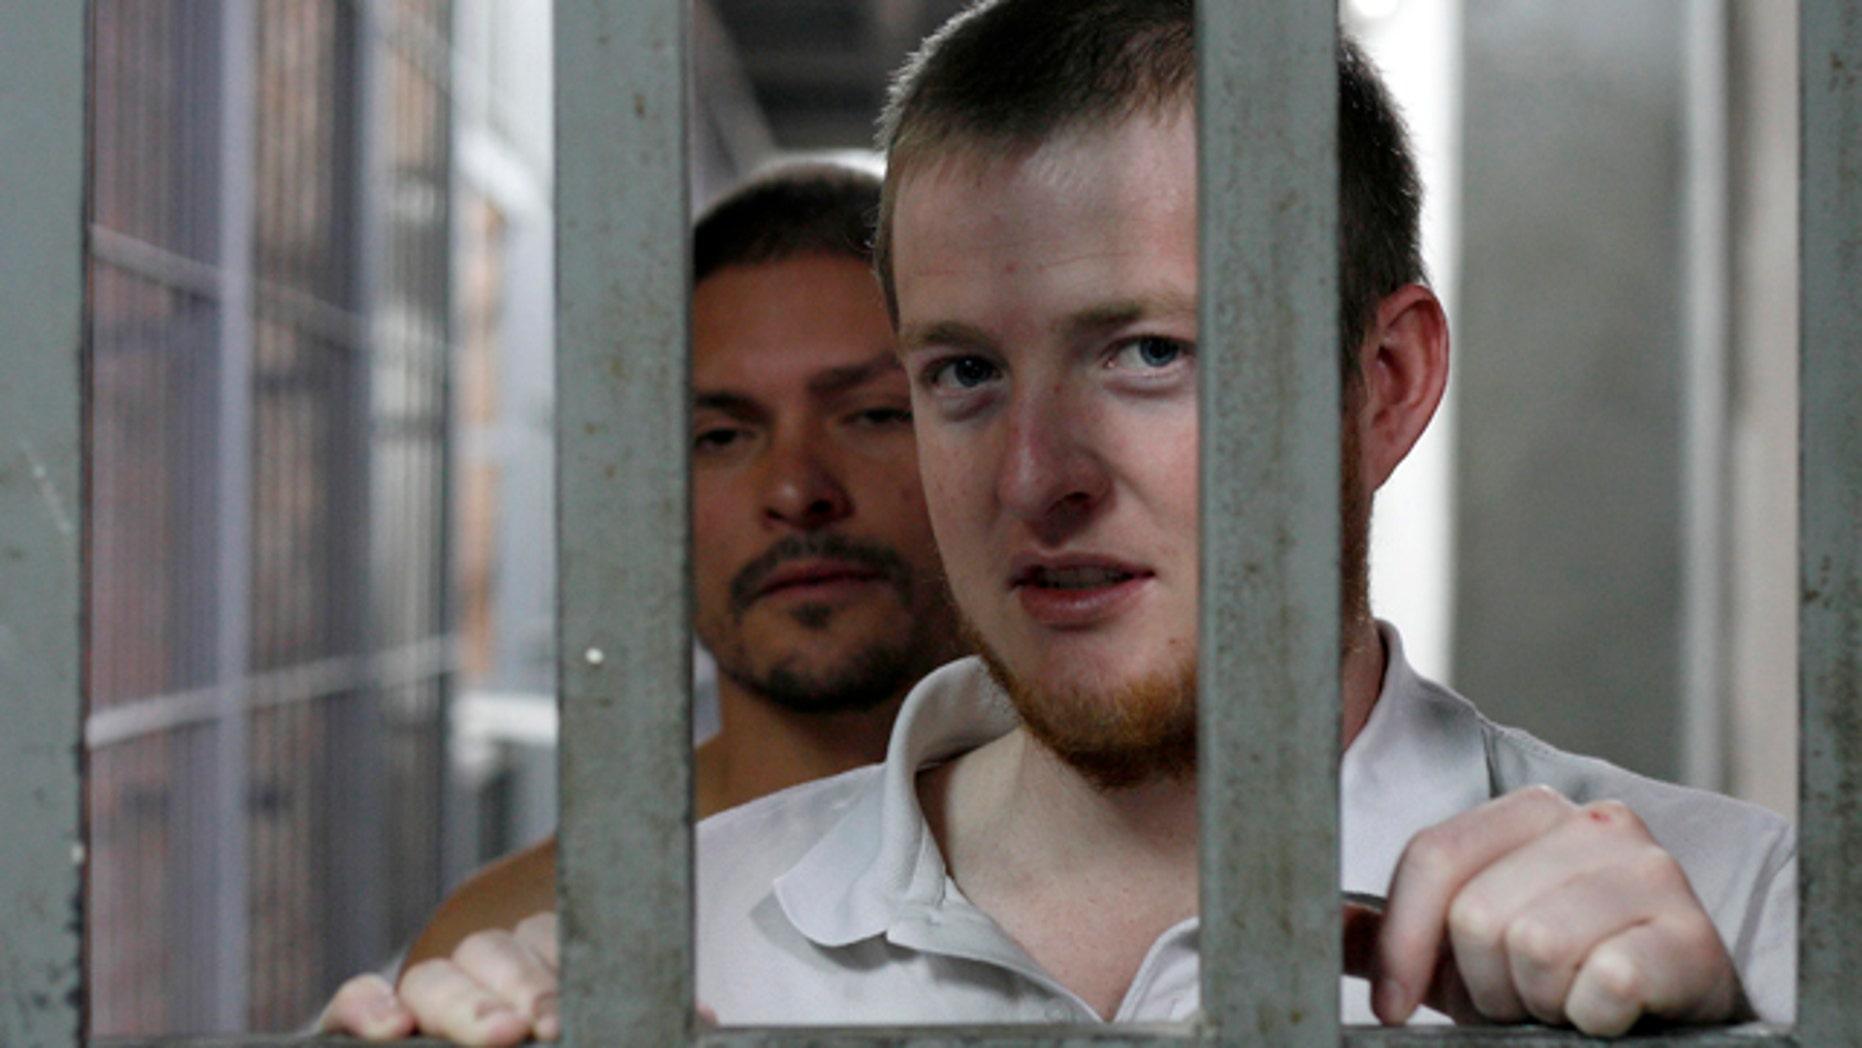 September 24, 2010: Shohn Huckabee (front) and Carlos Quijas, U.S. citizens and inmates at the jail in Ciudad Juarez talk to Reuters.